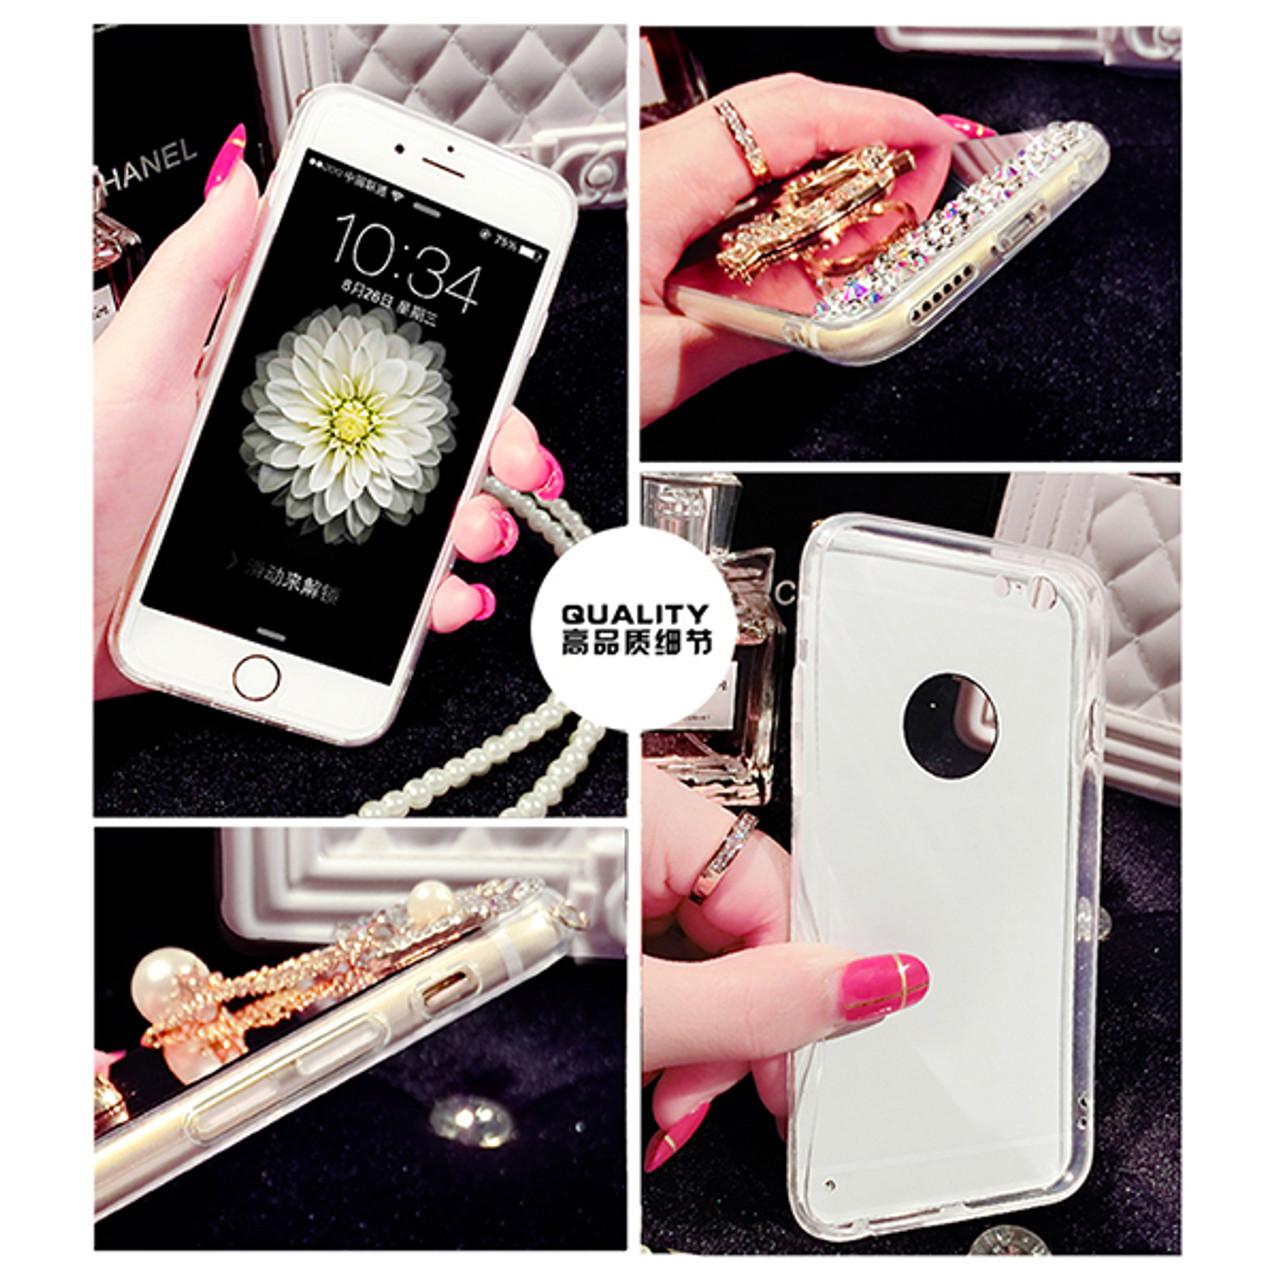 98bf59f7f ... Bling Star Crystal Rhinestone Diamond Case For iphone 6 Plus 5 5S 7 7  plus Phone ...